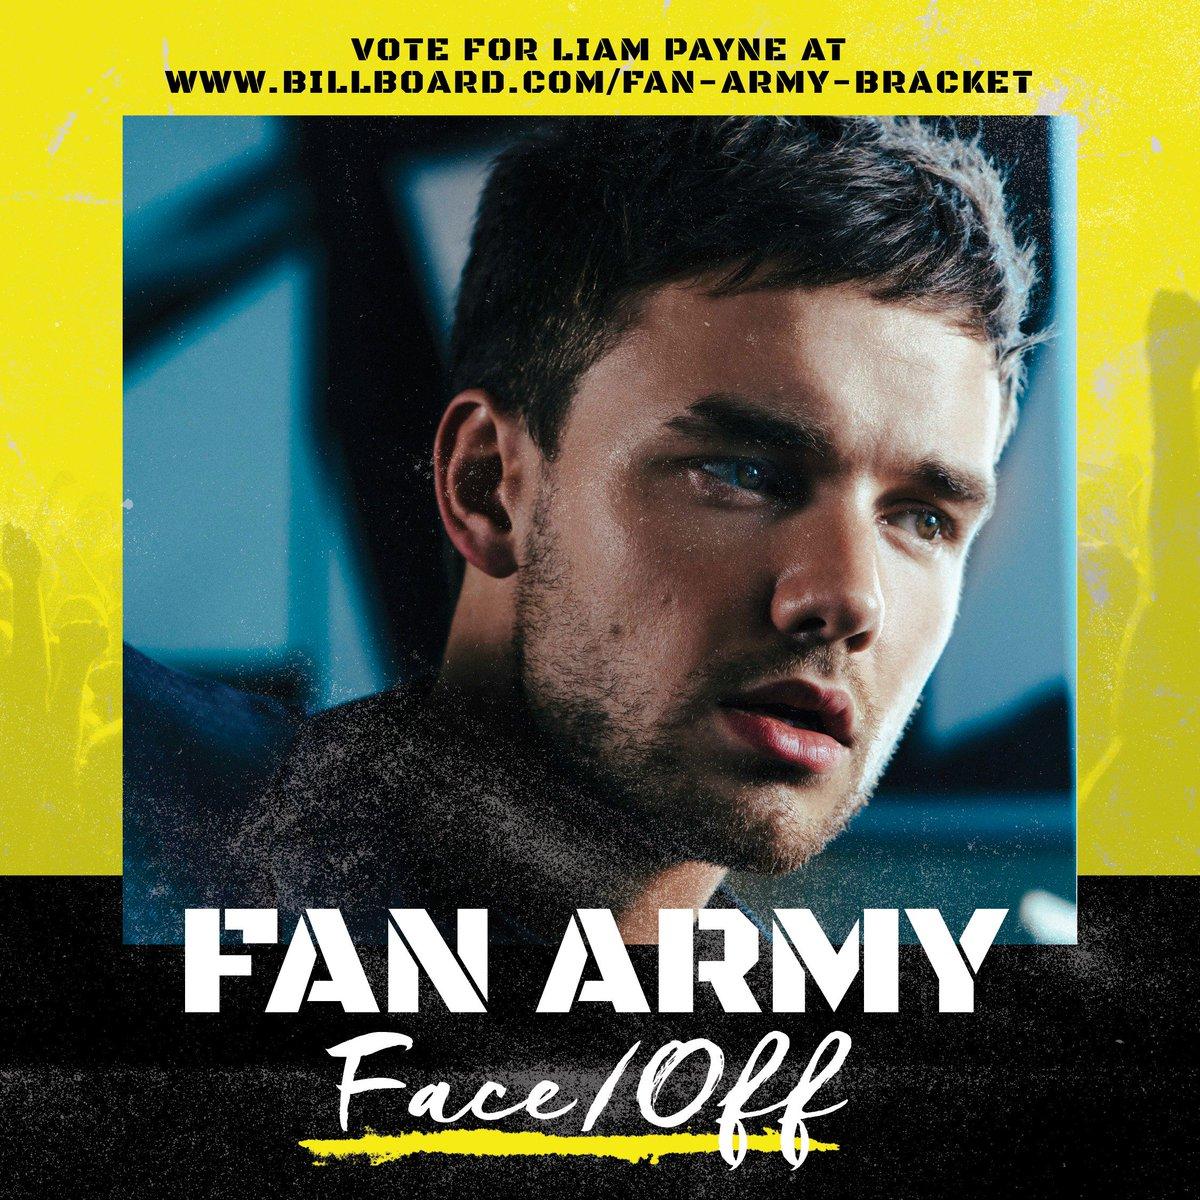 Liam Payne vs. #ELF  #FanArmyFaceOff voting is open: https://t.co/r7iW6Rc6z9